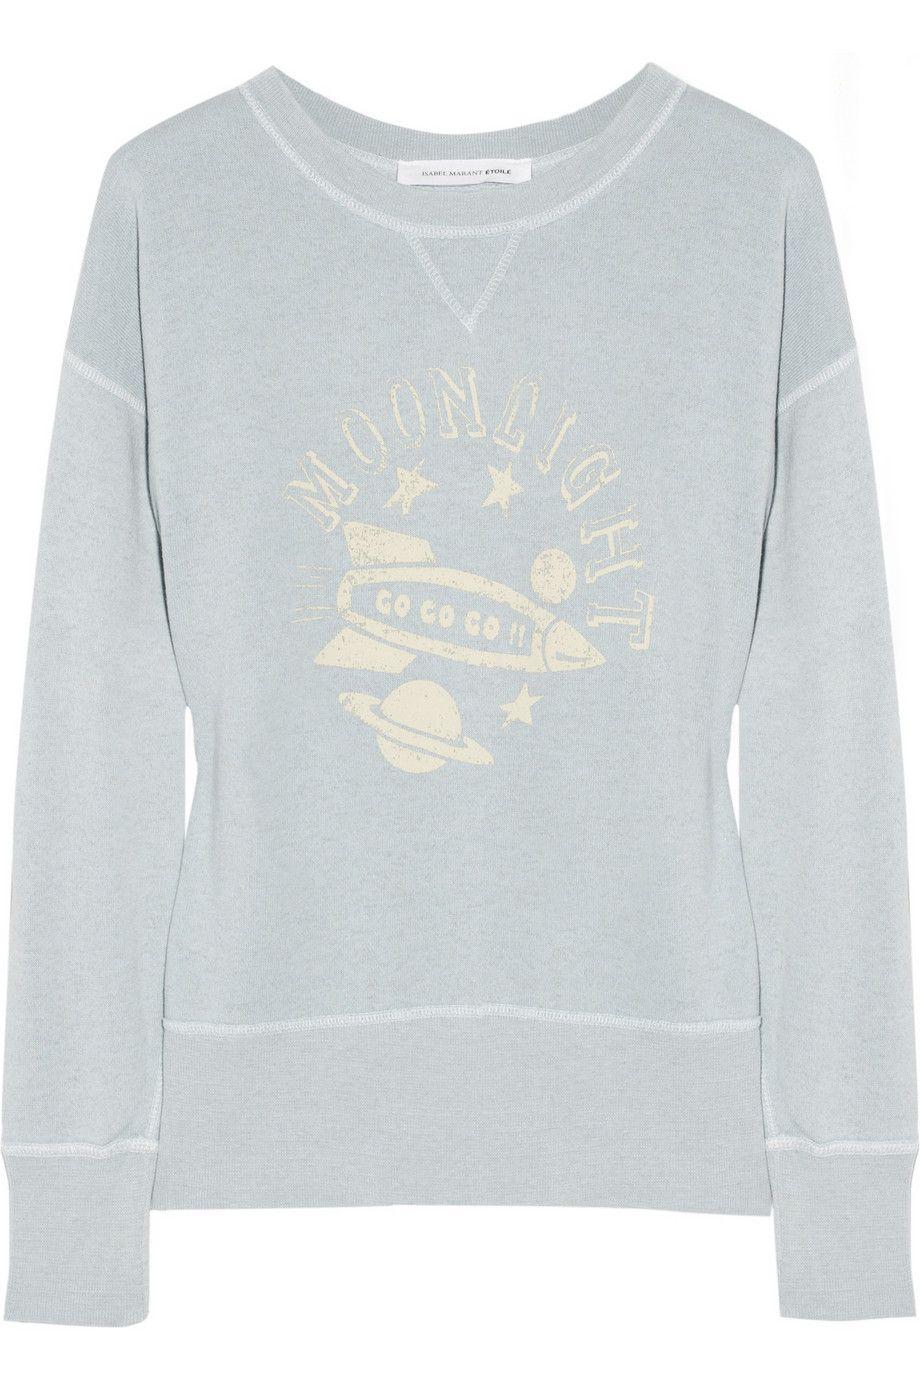 201 Toile Isabel Marant Noah Printed Jersey Sweatshirt